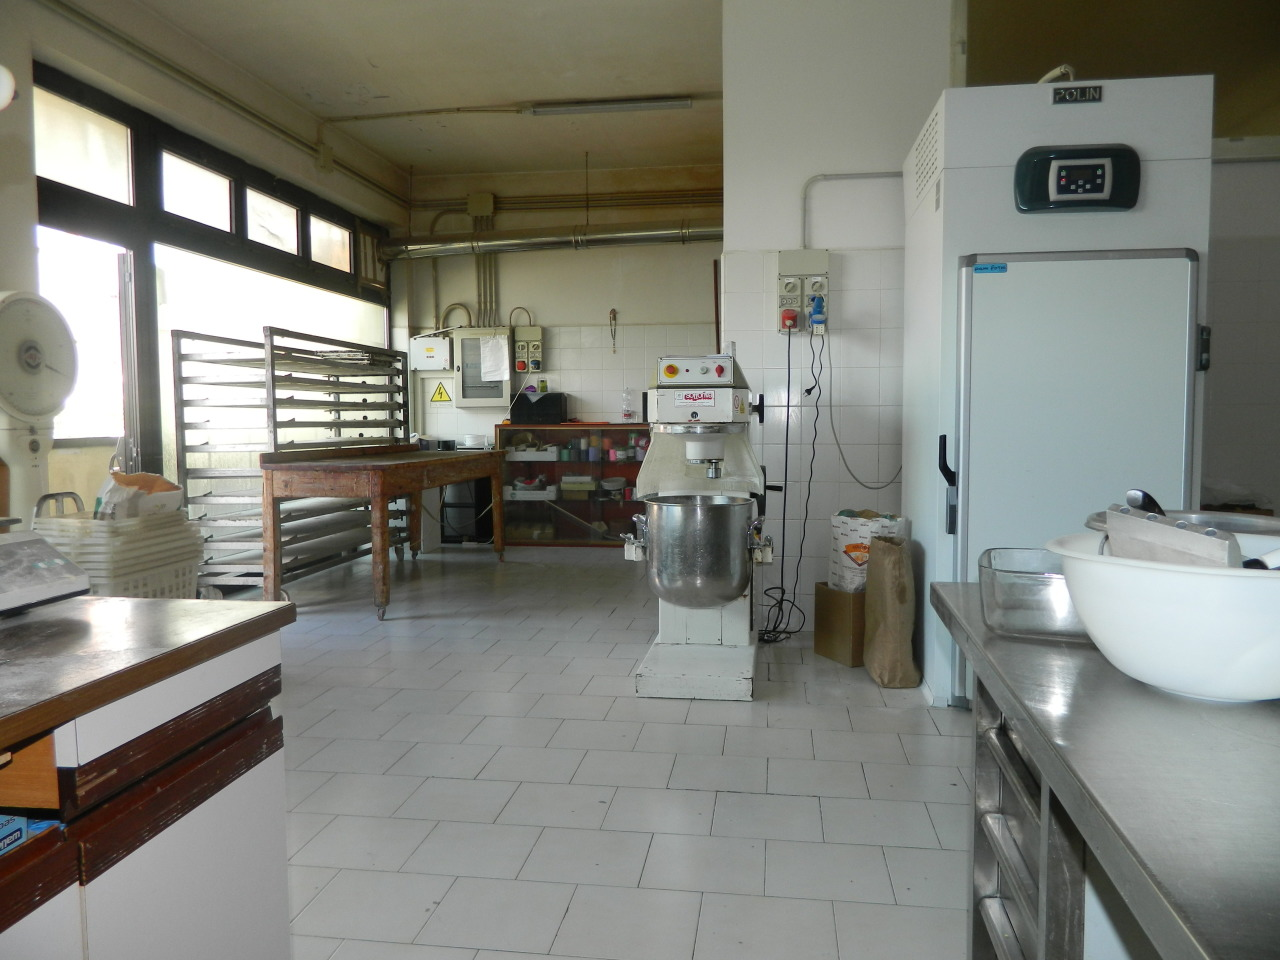 Forno a Castelnuovo Magra Rif. 9720583